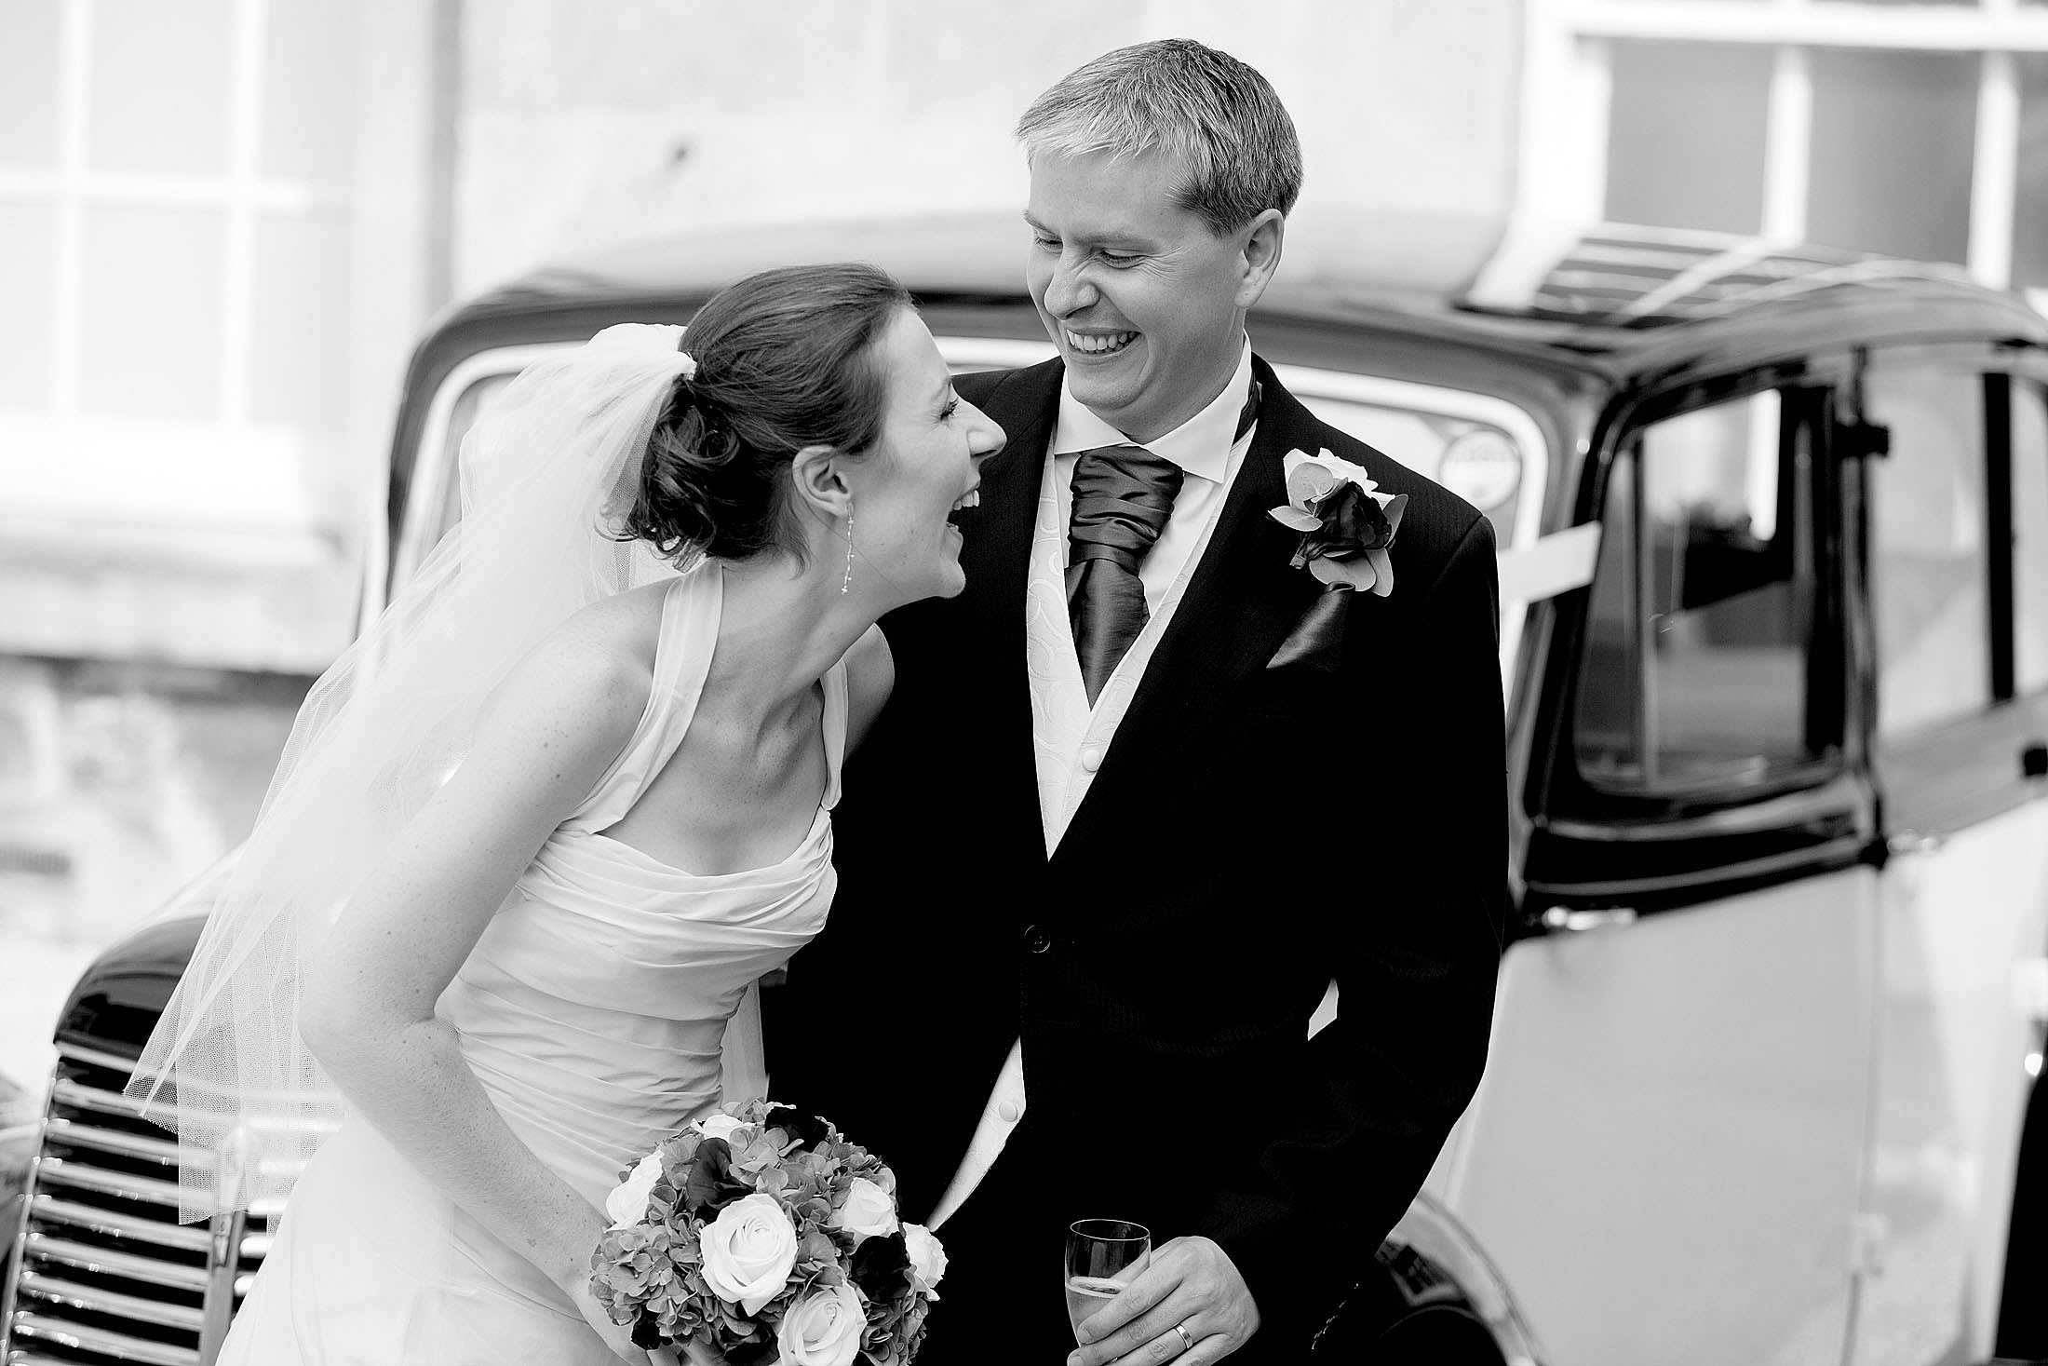 Blenheim Palace wedding photographer